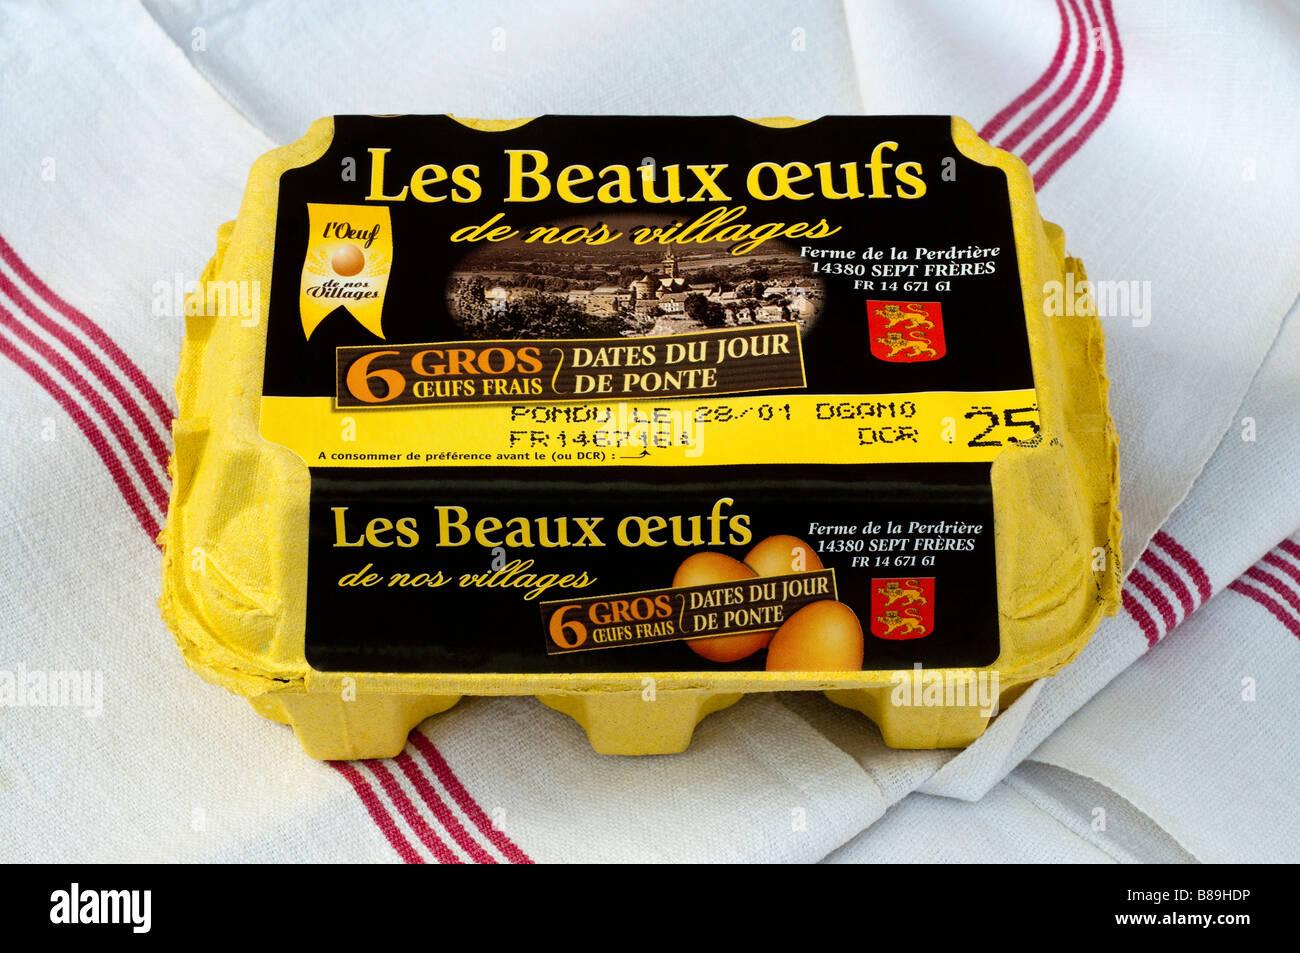 French carton / box of 6 large fresh farm eggs. - Stock Image